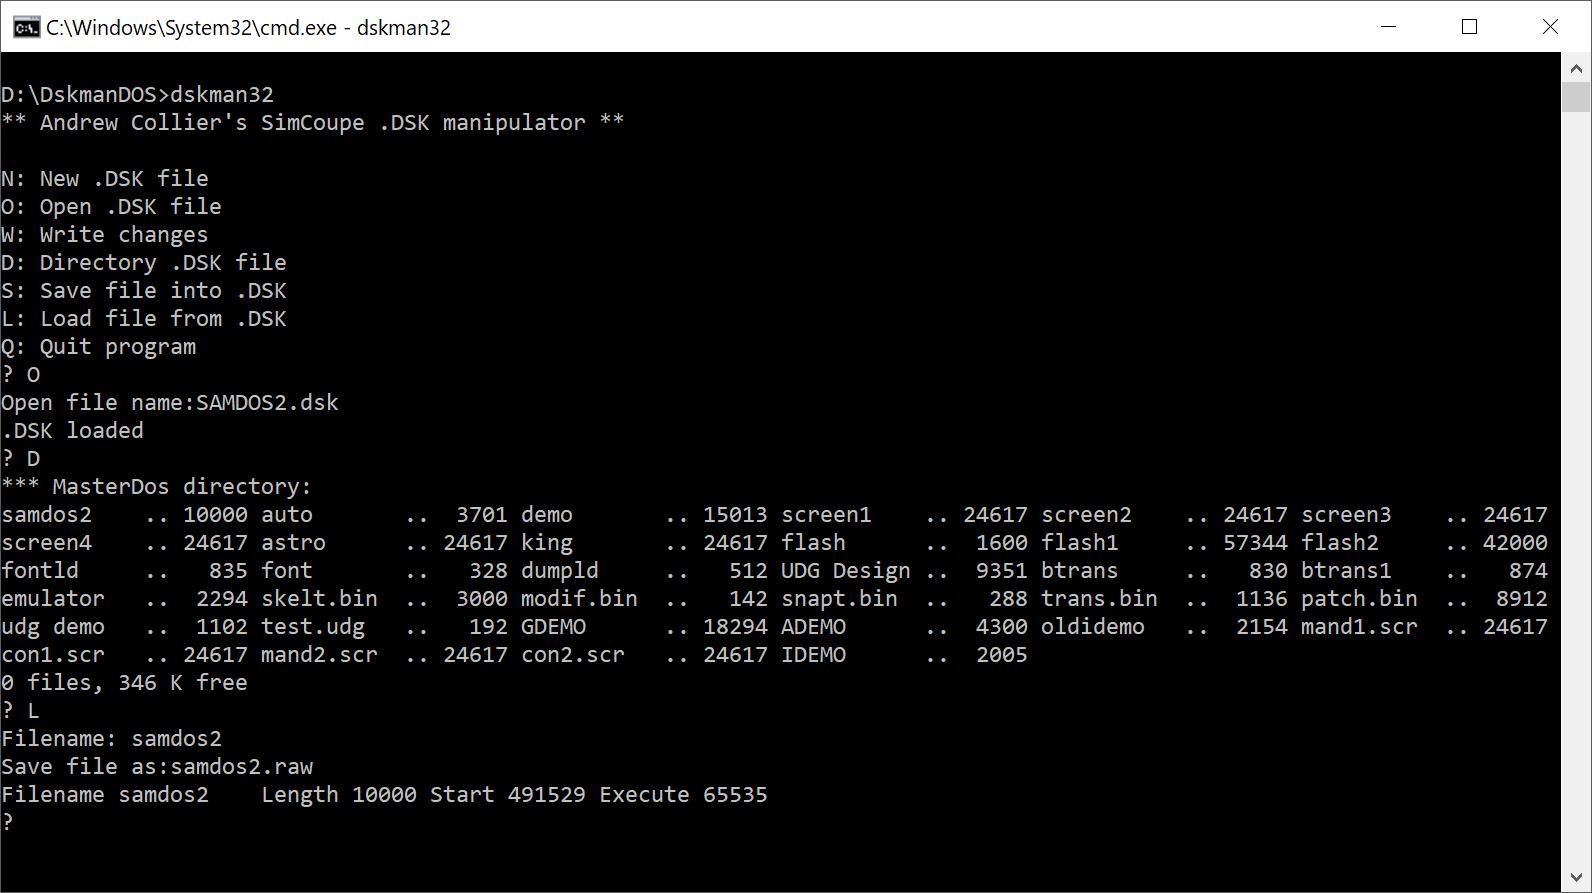 Assembly Code Tools - DiskmanDOS SAMDOS2 Extract File